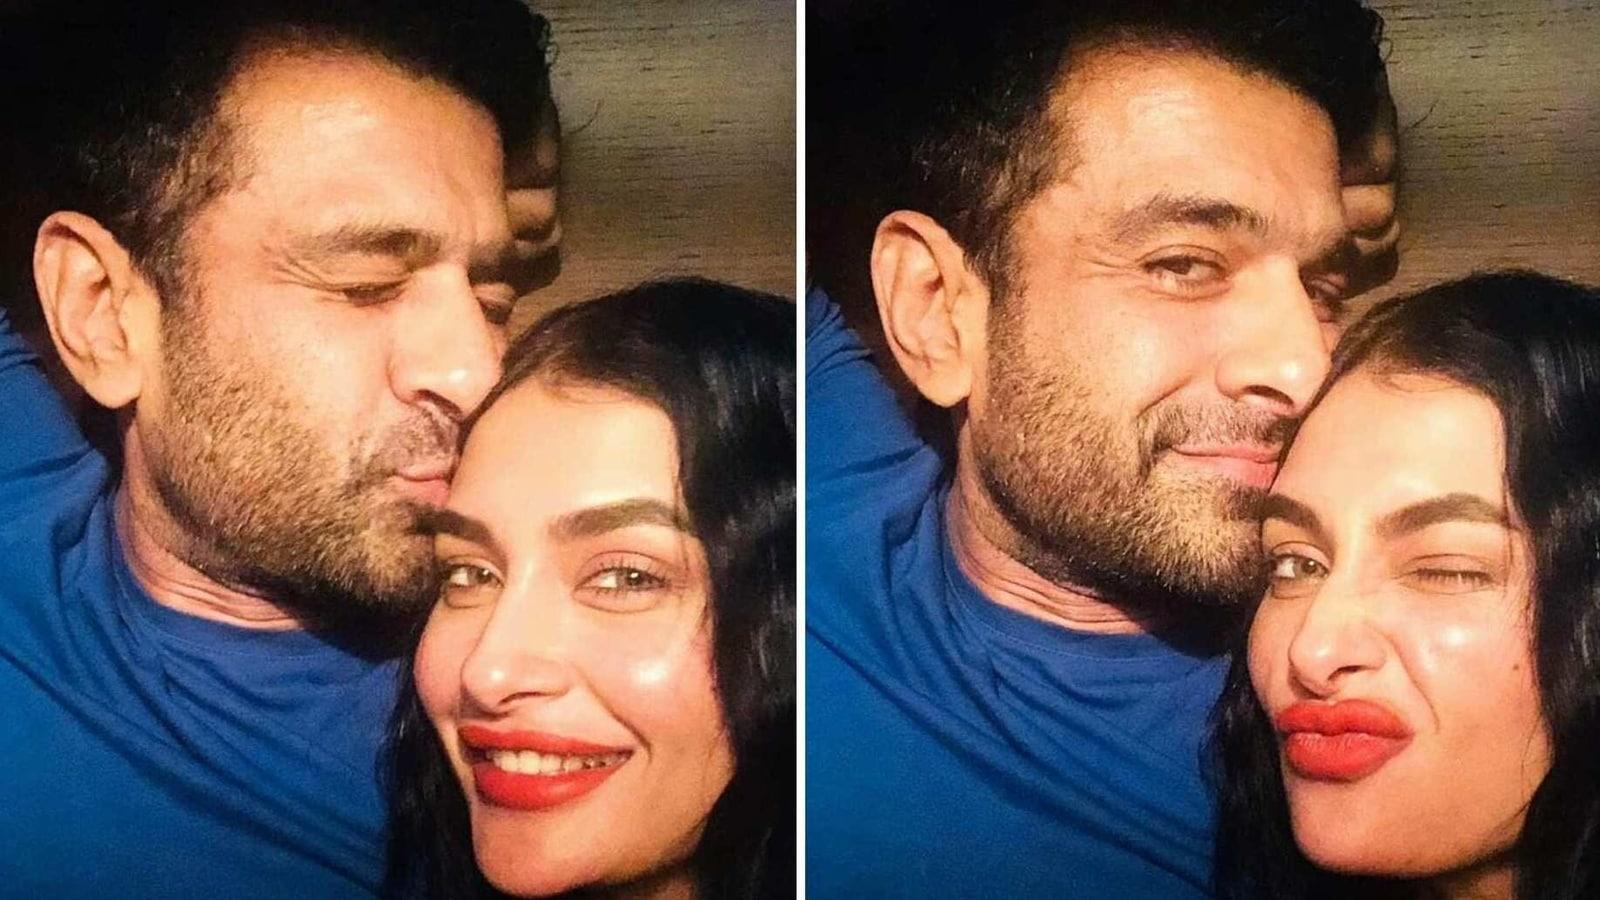 Eijaz Khan shares cute photos, video with Pavitra Punia as she hits 1 million Instagram followers: 'I love u 1 million' - Hindustan Times